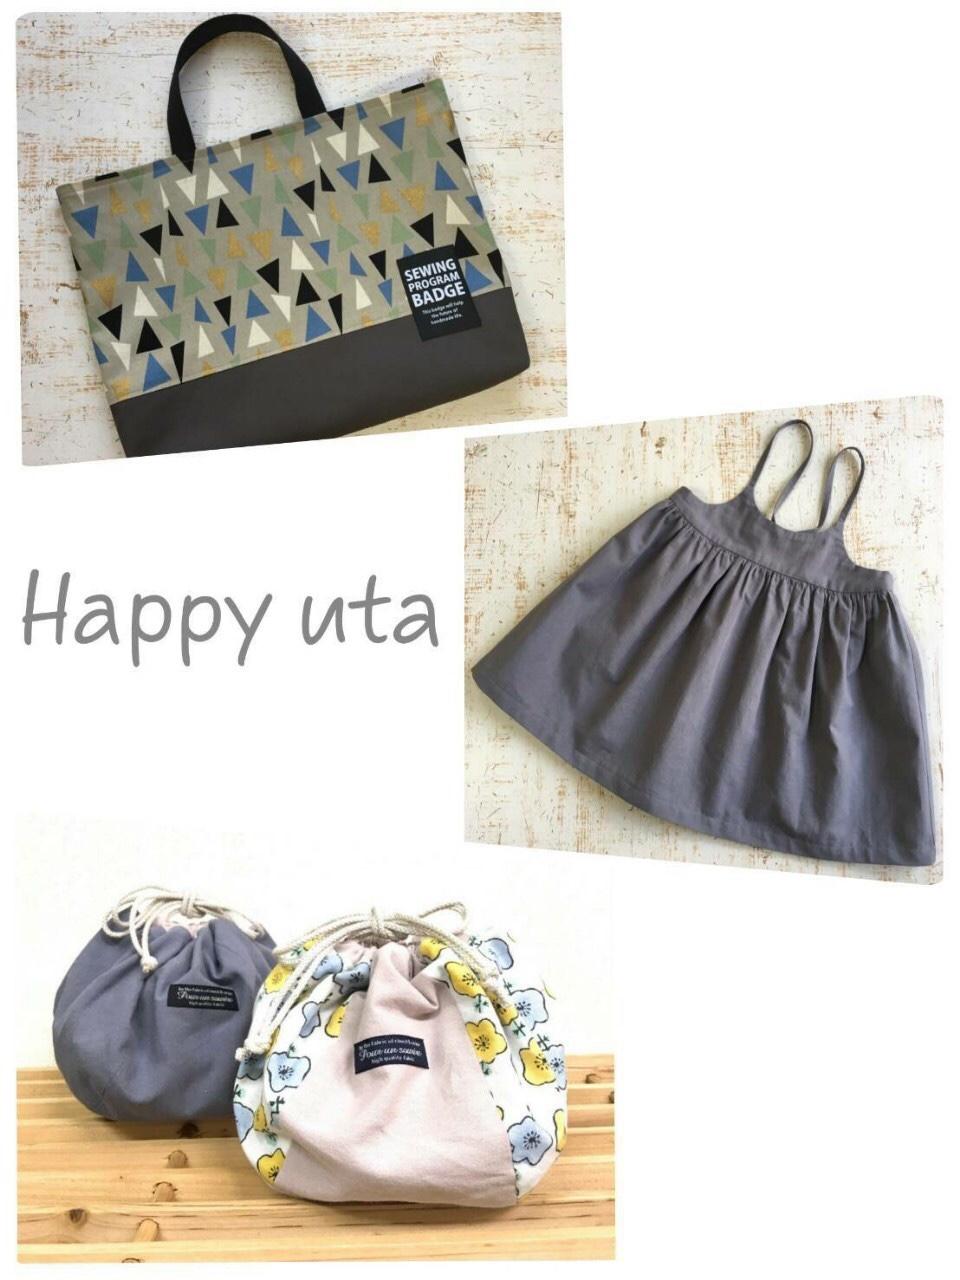 Happy uta